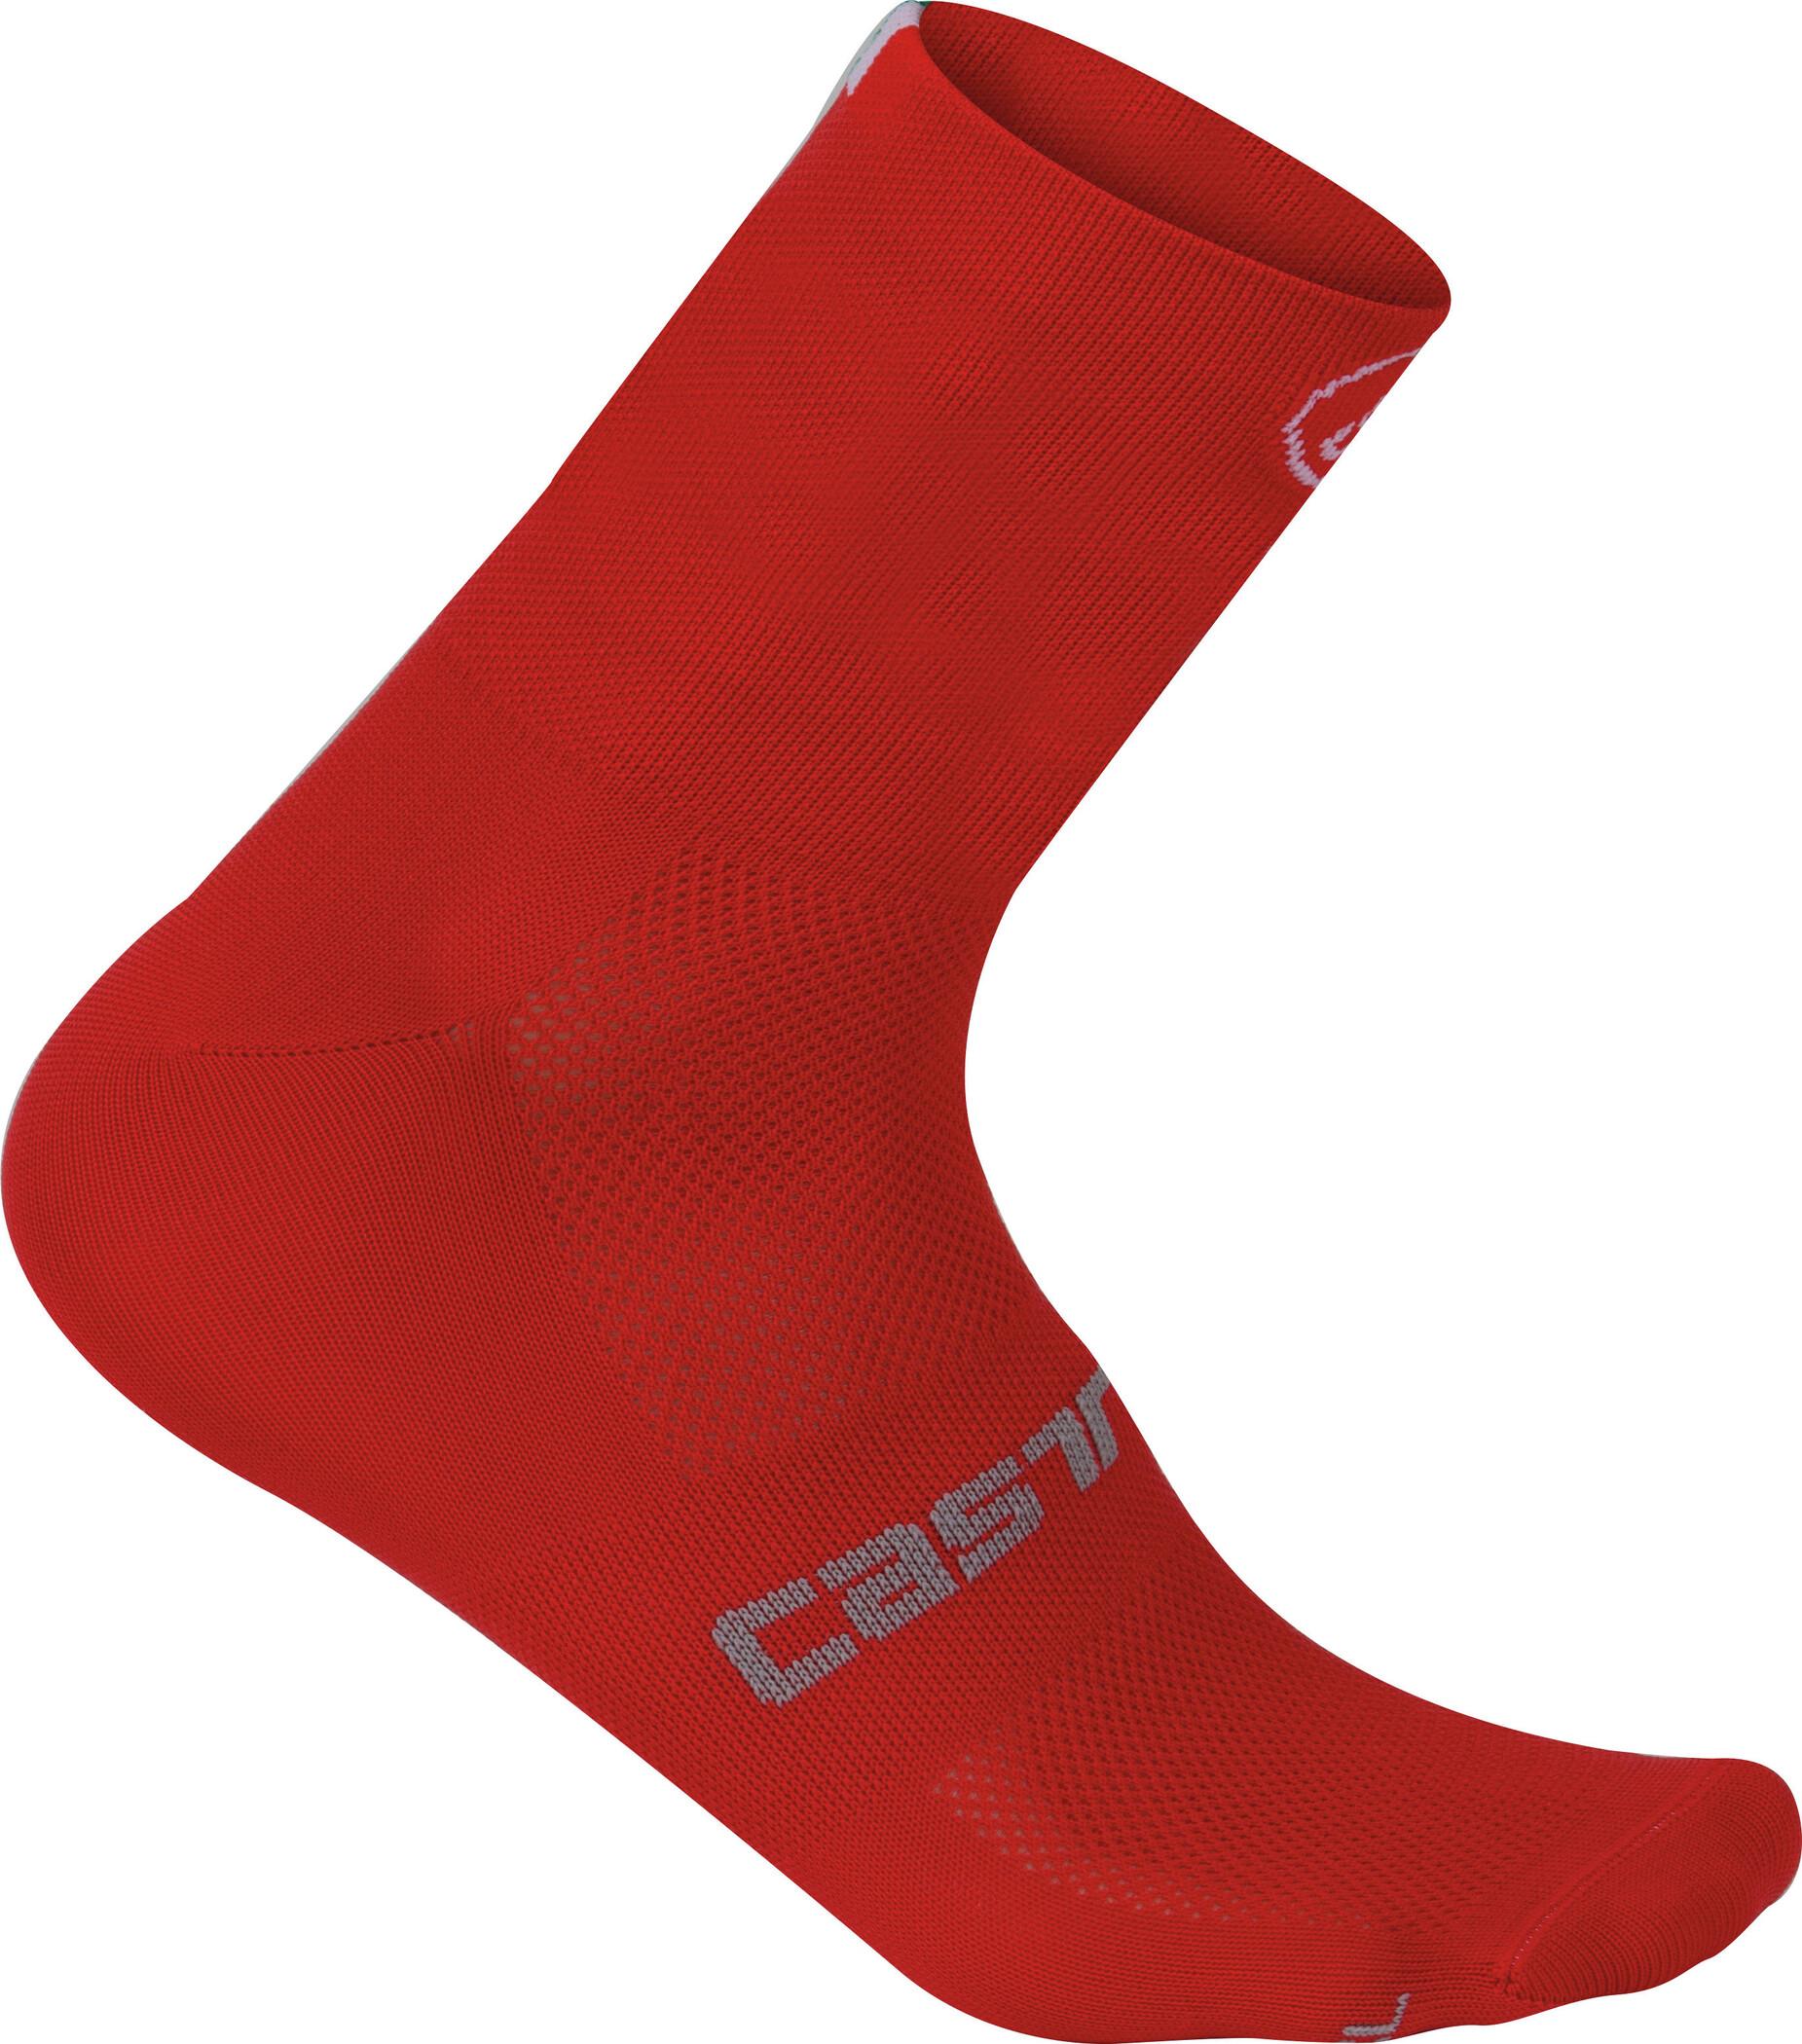 Castelli Quattro 9 Strømper, red (2019) | Socks